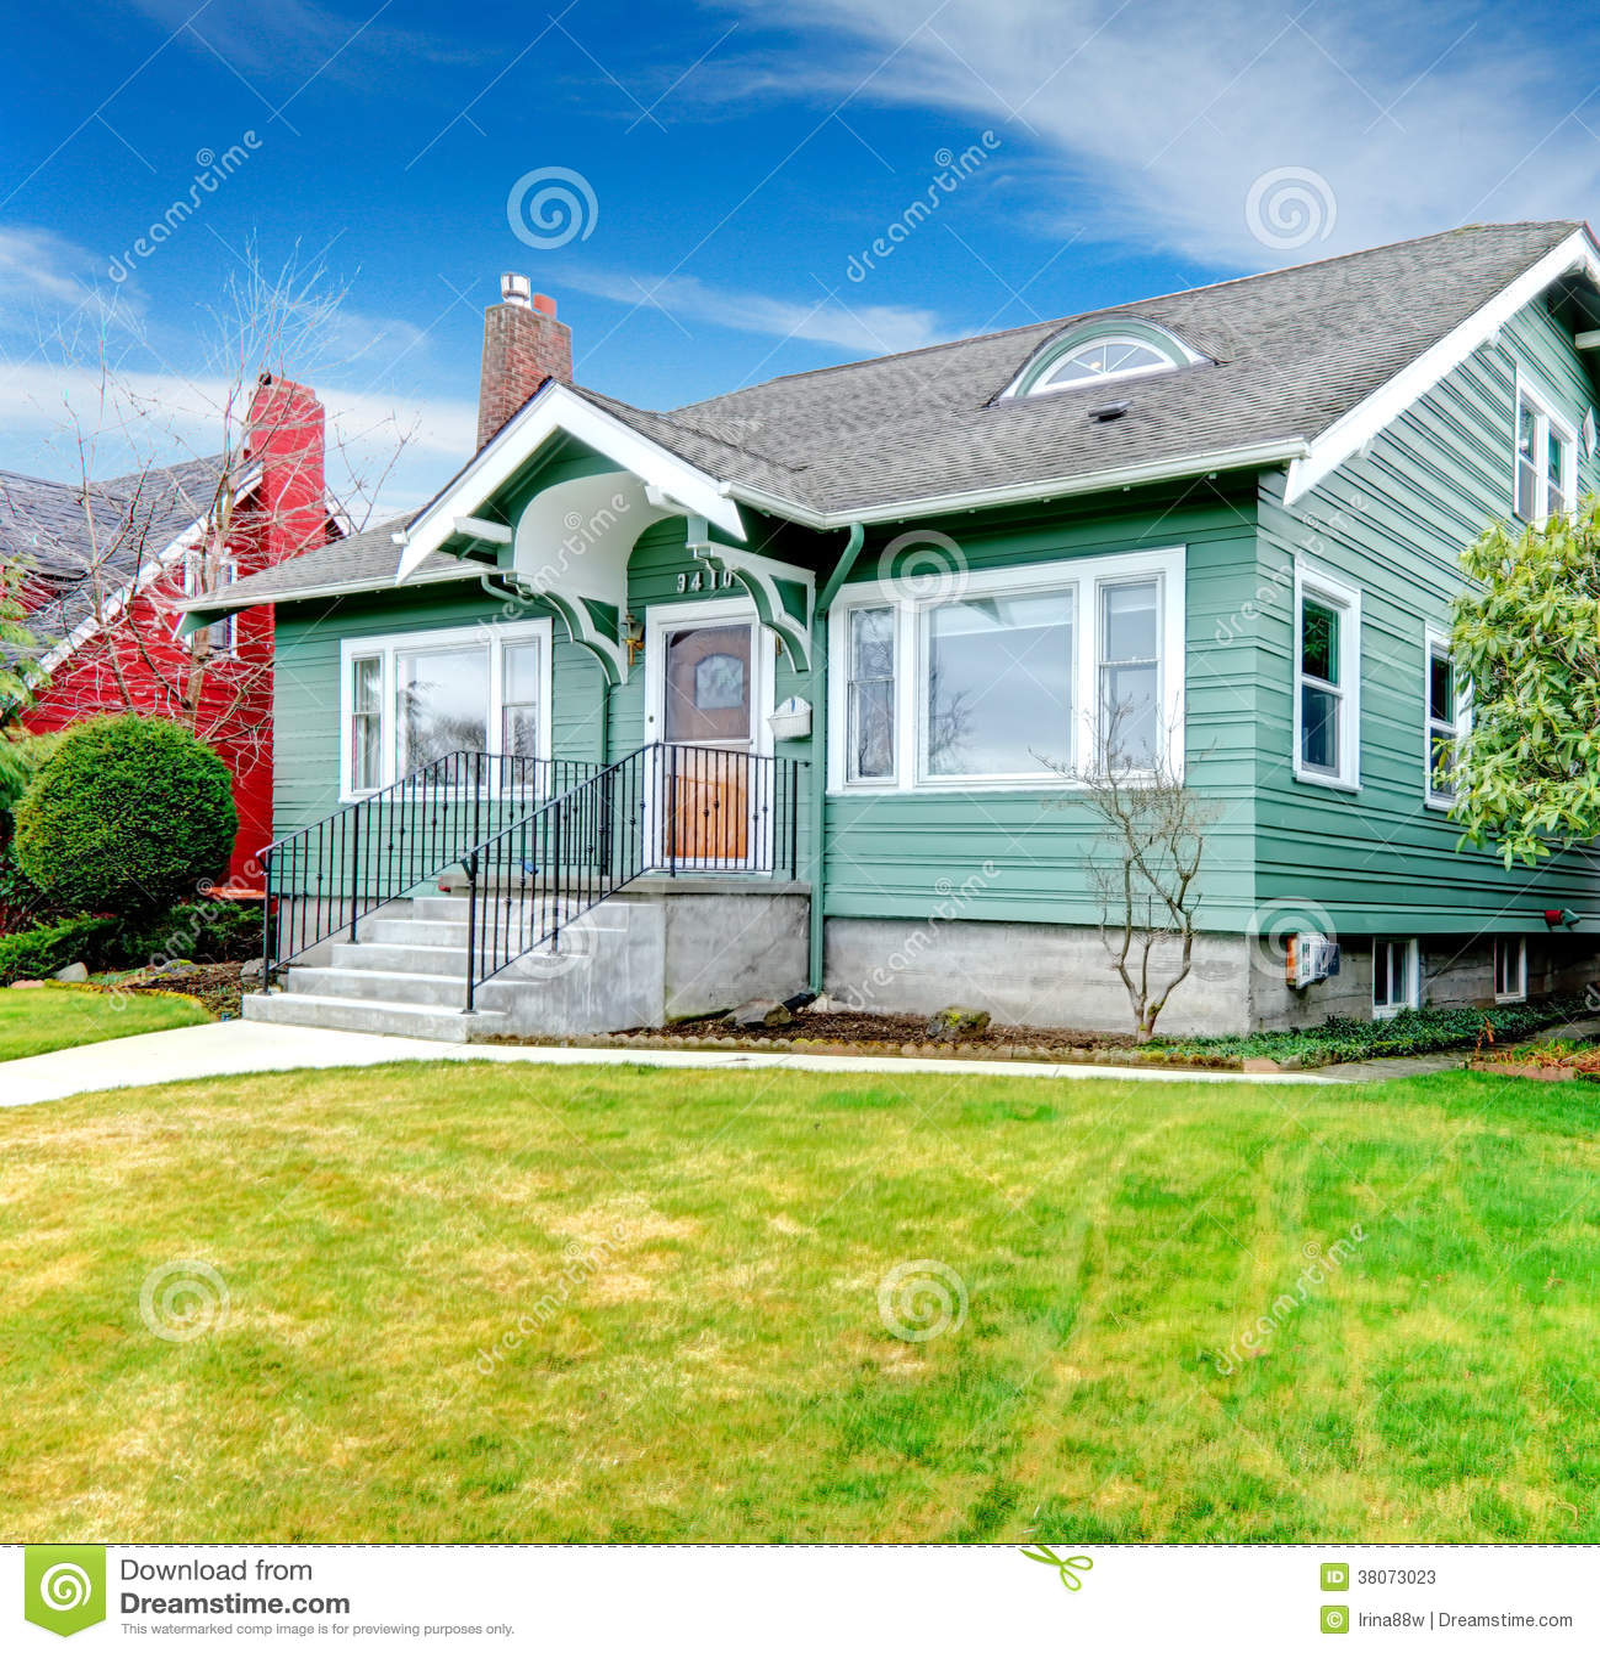 Small Clapboard Siding House Stock Photos Image 38073023